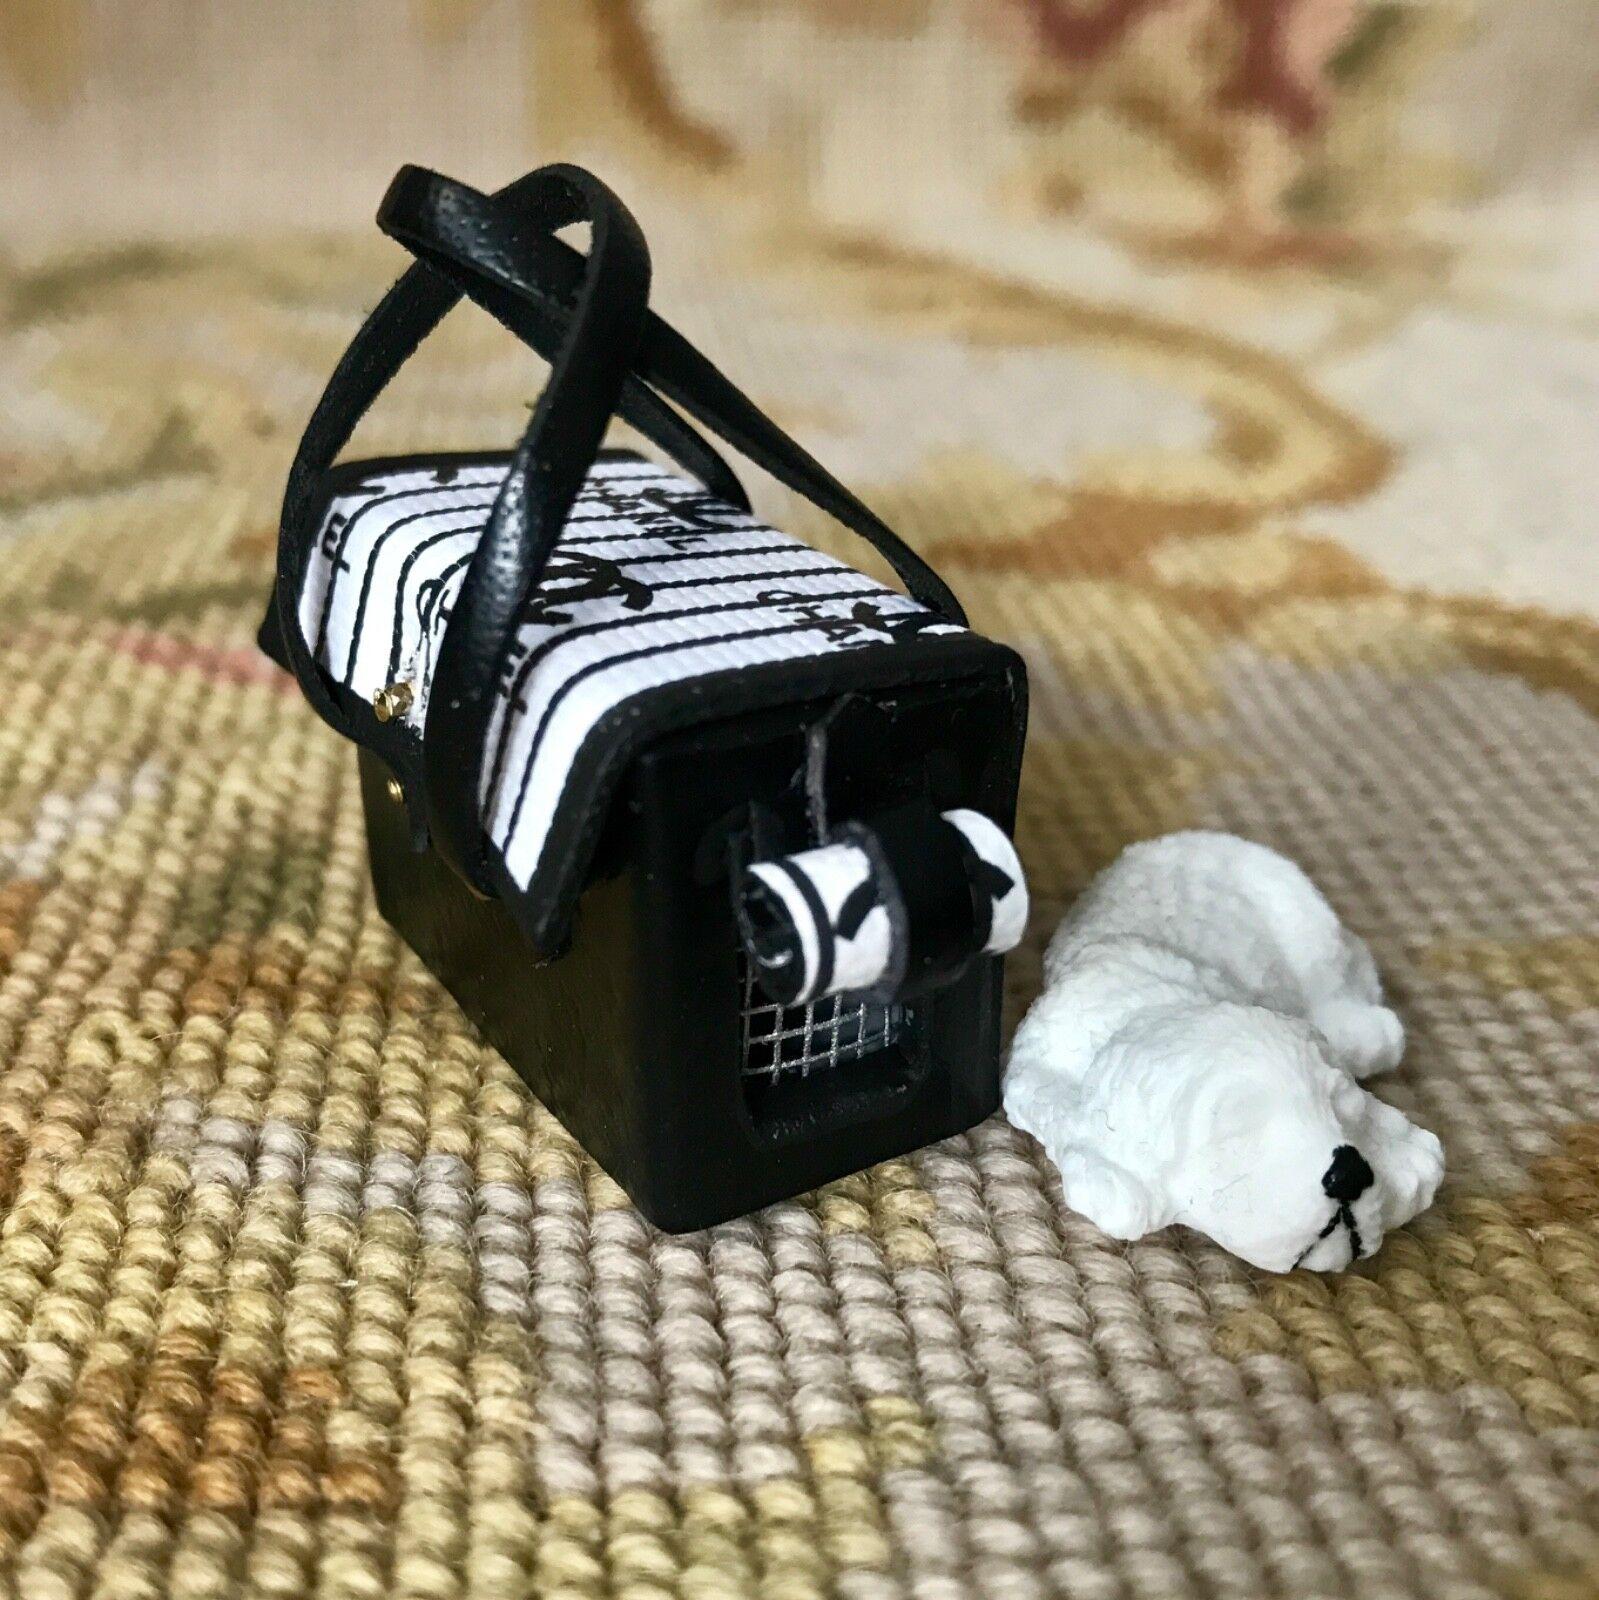 bienvenido a comprar Pat Tyler Casa de Muñecas en en en Miniatura Perro Mascota Bolsa De Equipaje Maleta Con Perro p563  solo para ti